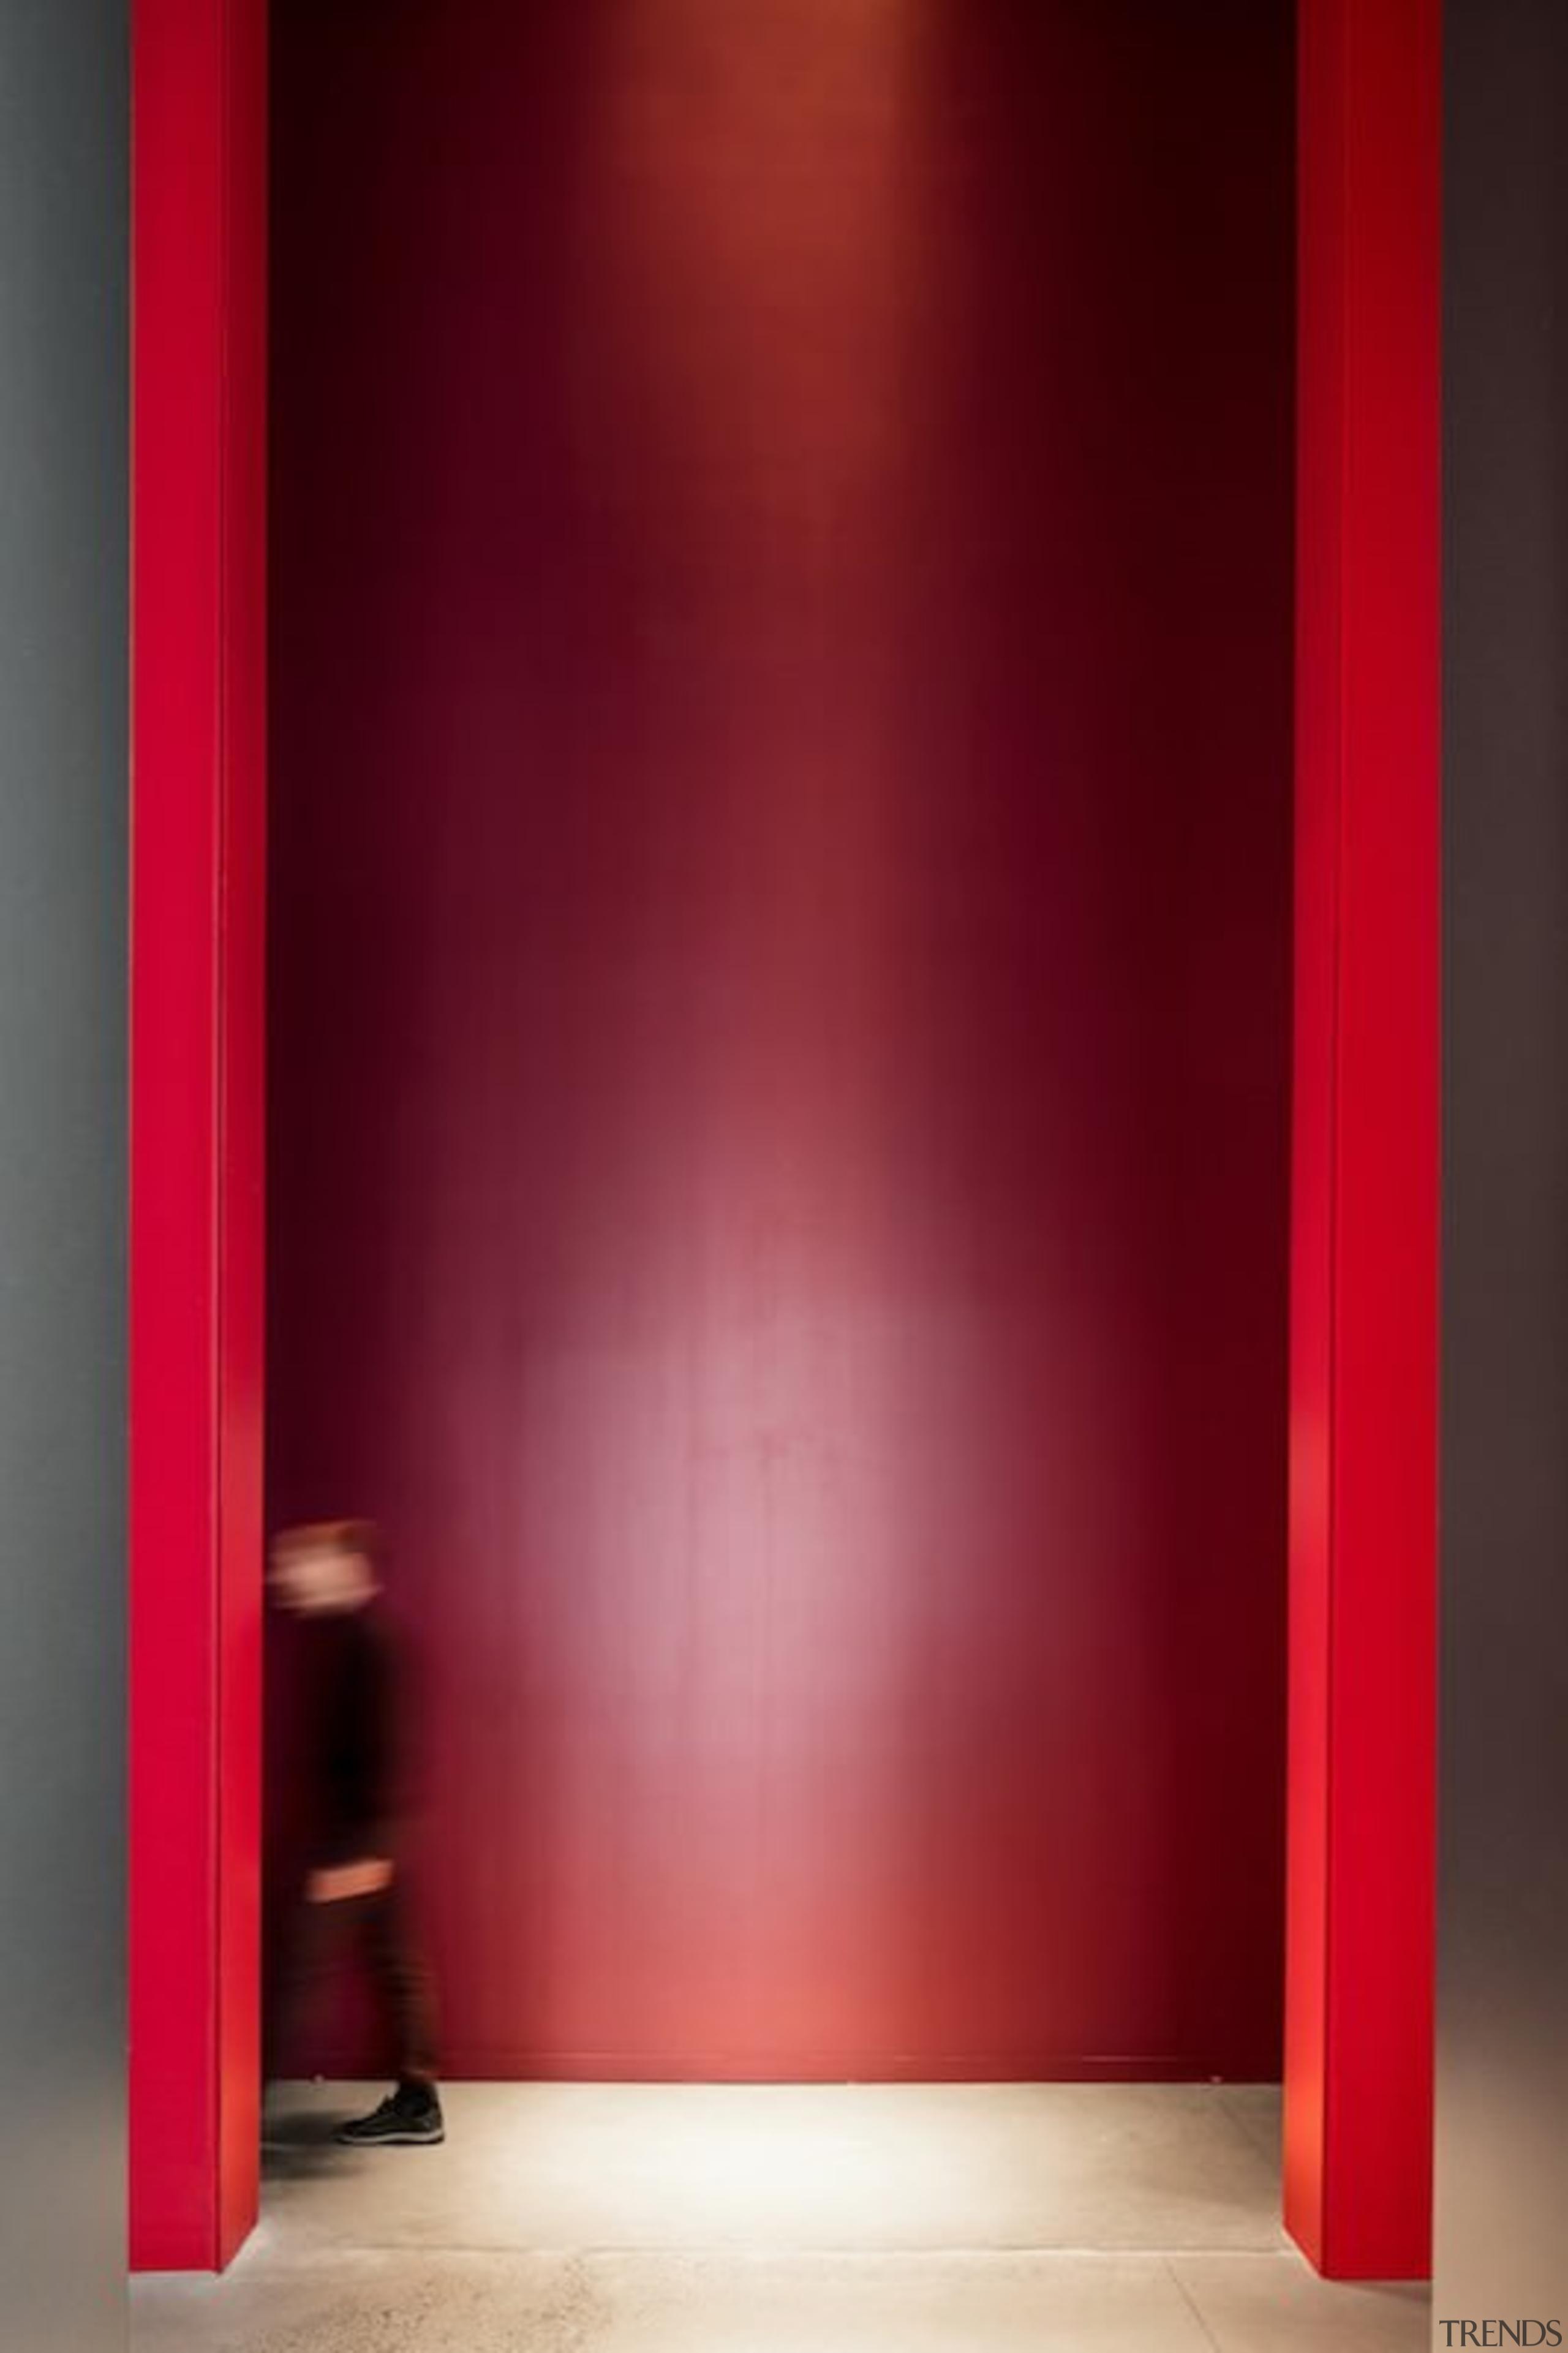 This massive doorway is certainly imposing - This door, floor, interior design, light, lighting, red, wall, red